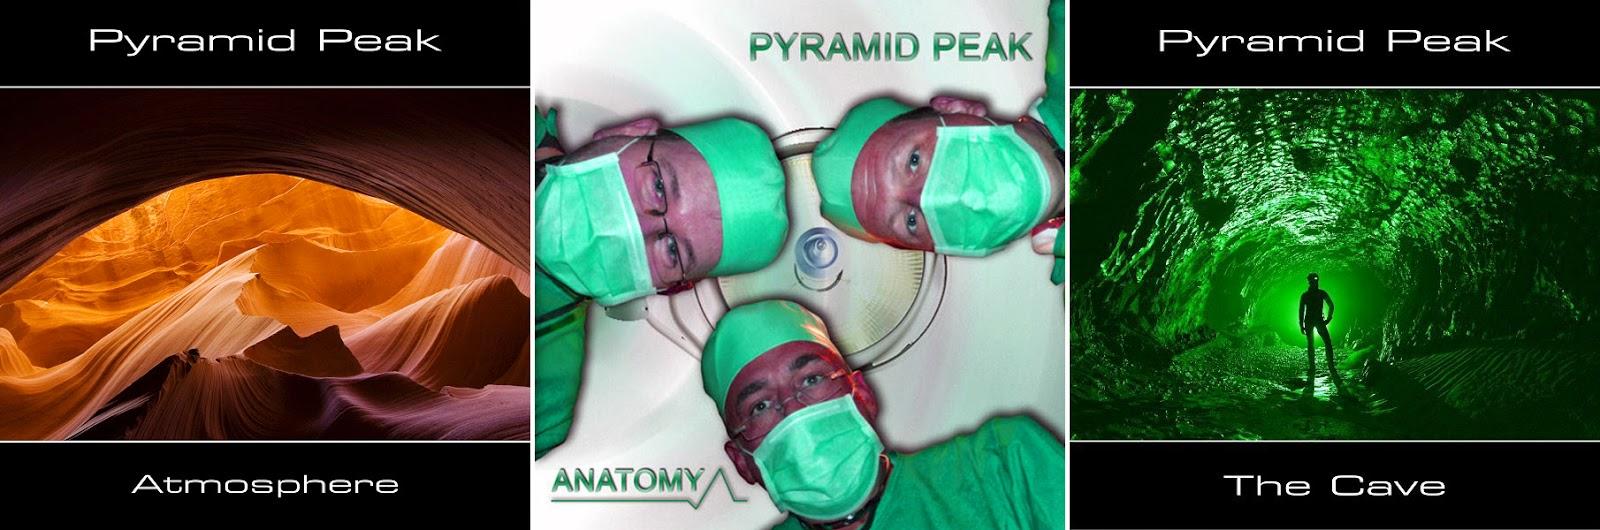 Pyramid Peak CD covers / source : www.syngate.biz